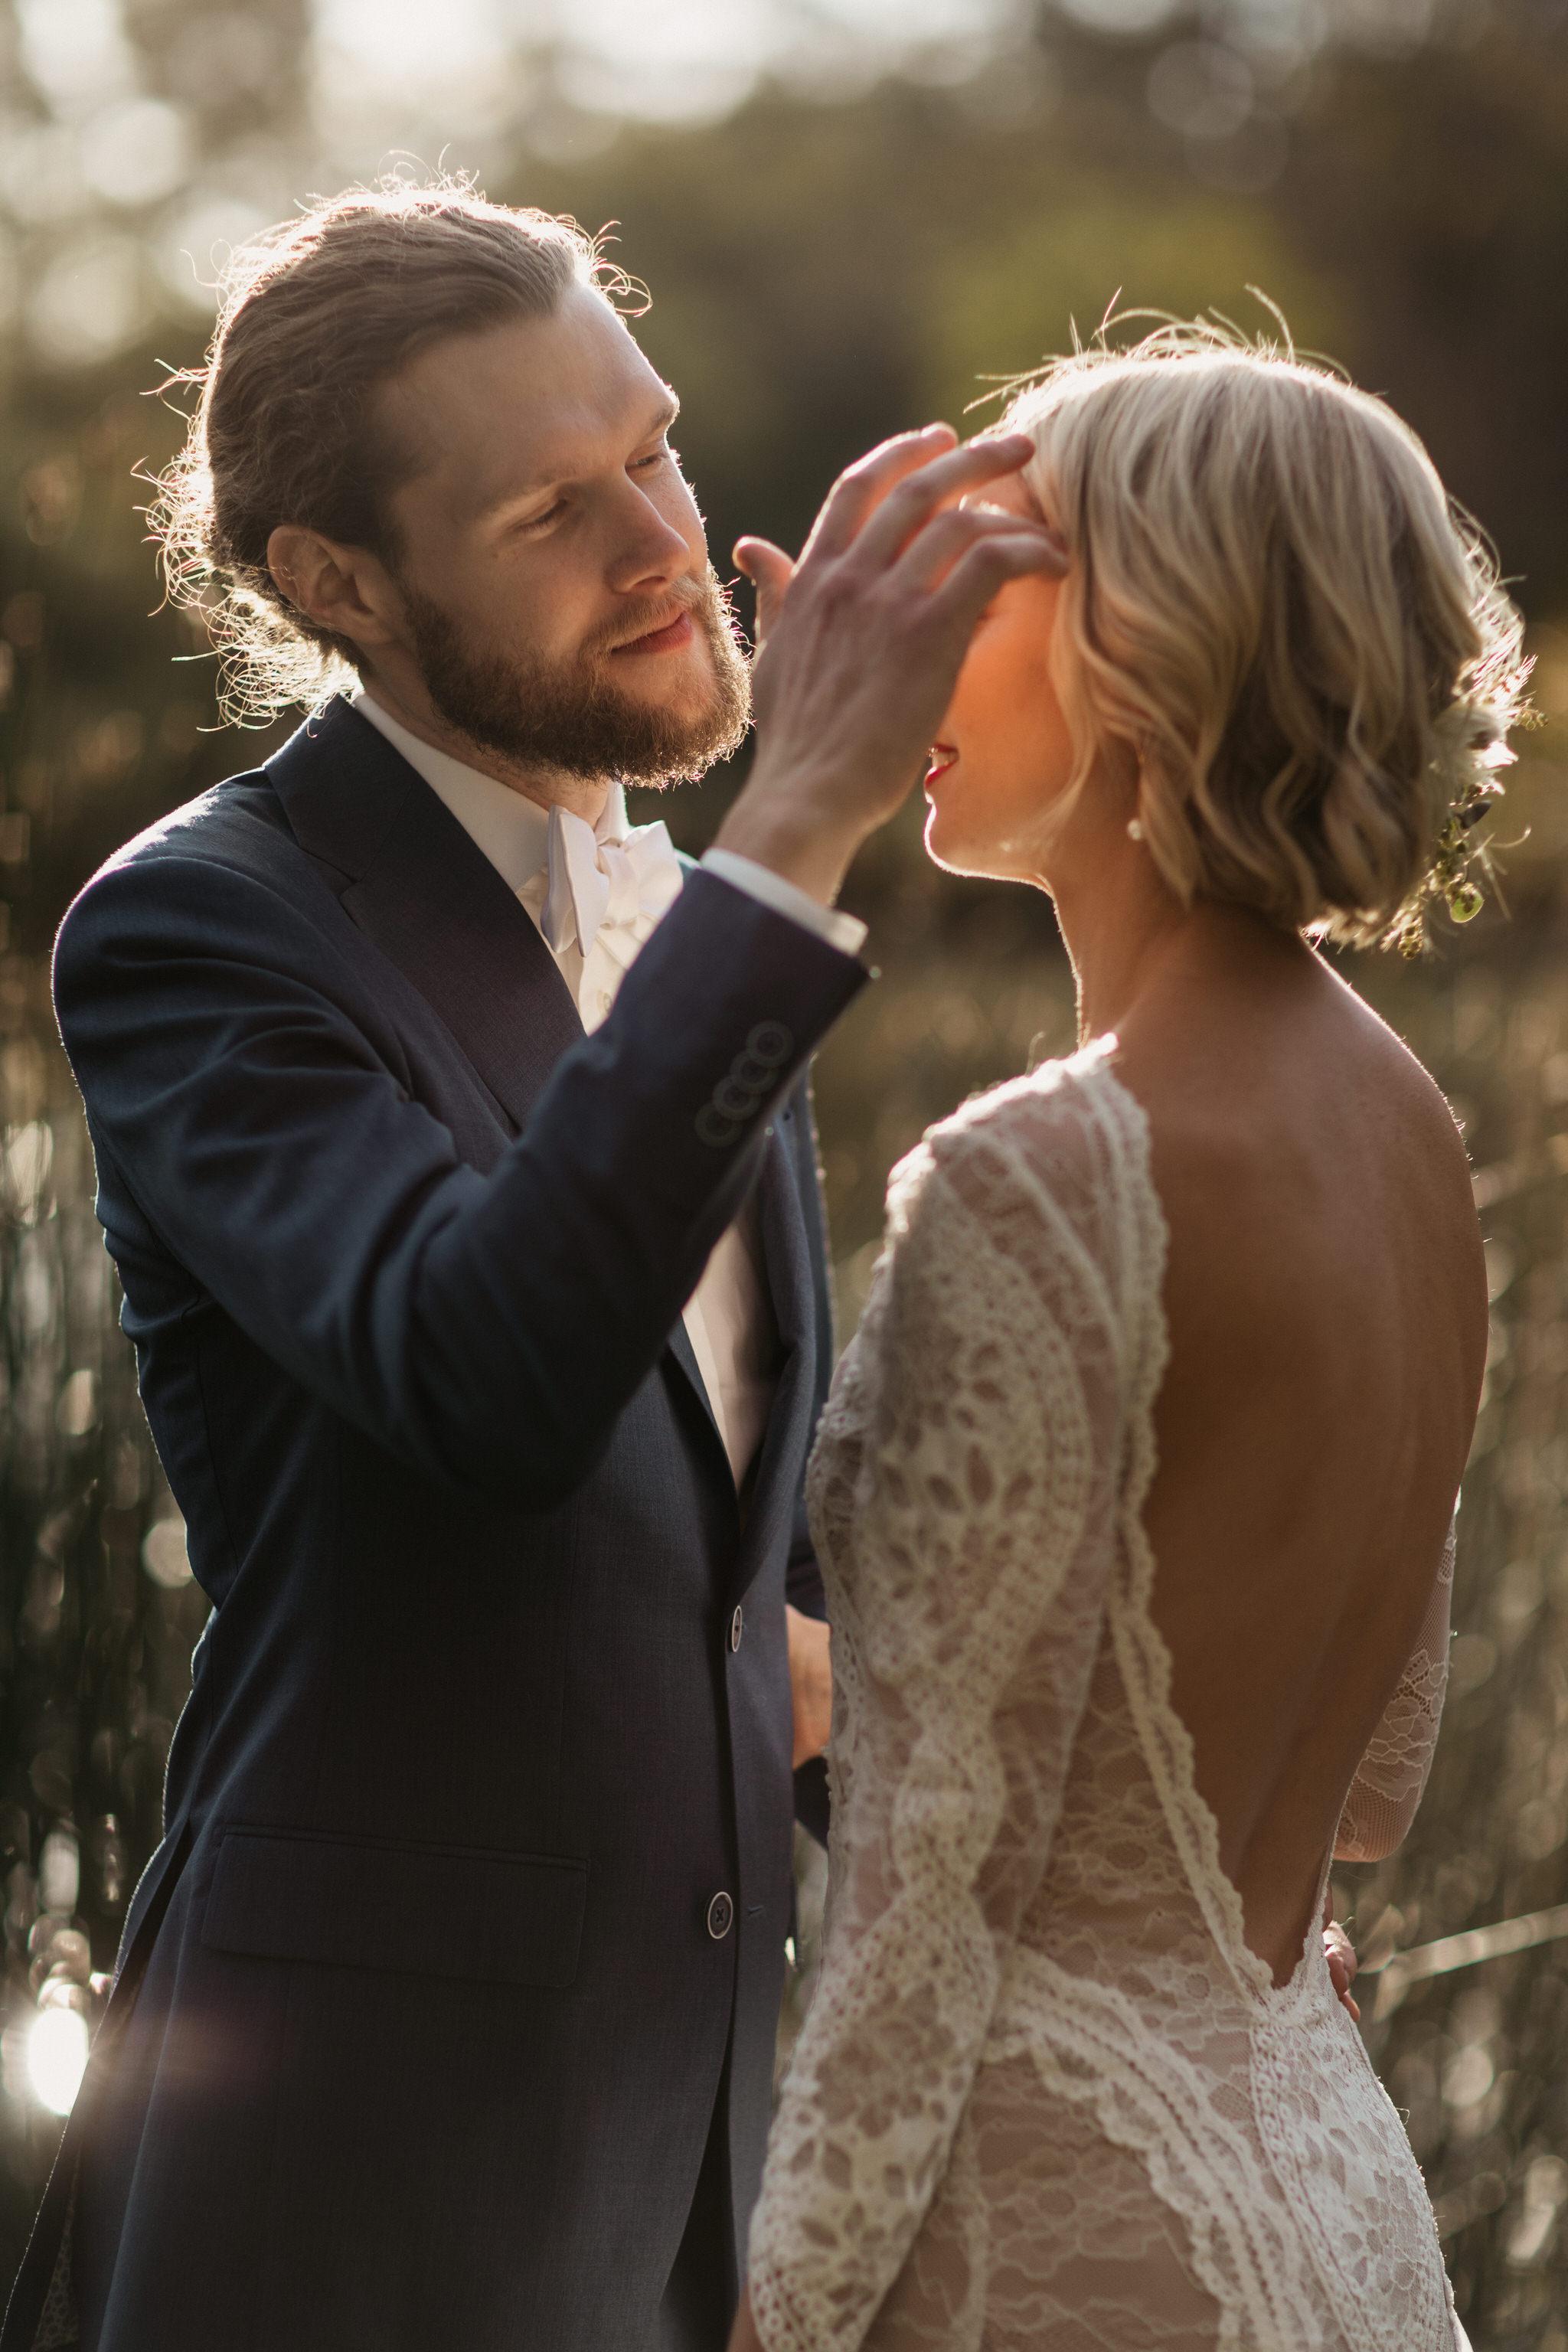 065_SBA-Jen-Tom-Wedding-259_Sunshine_Coast_wedding_photographer.jpg